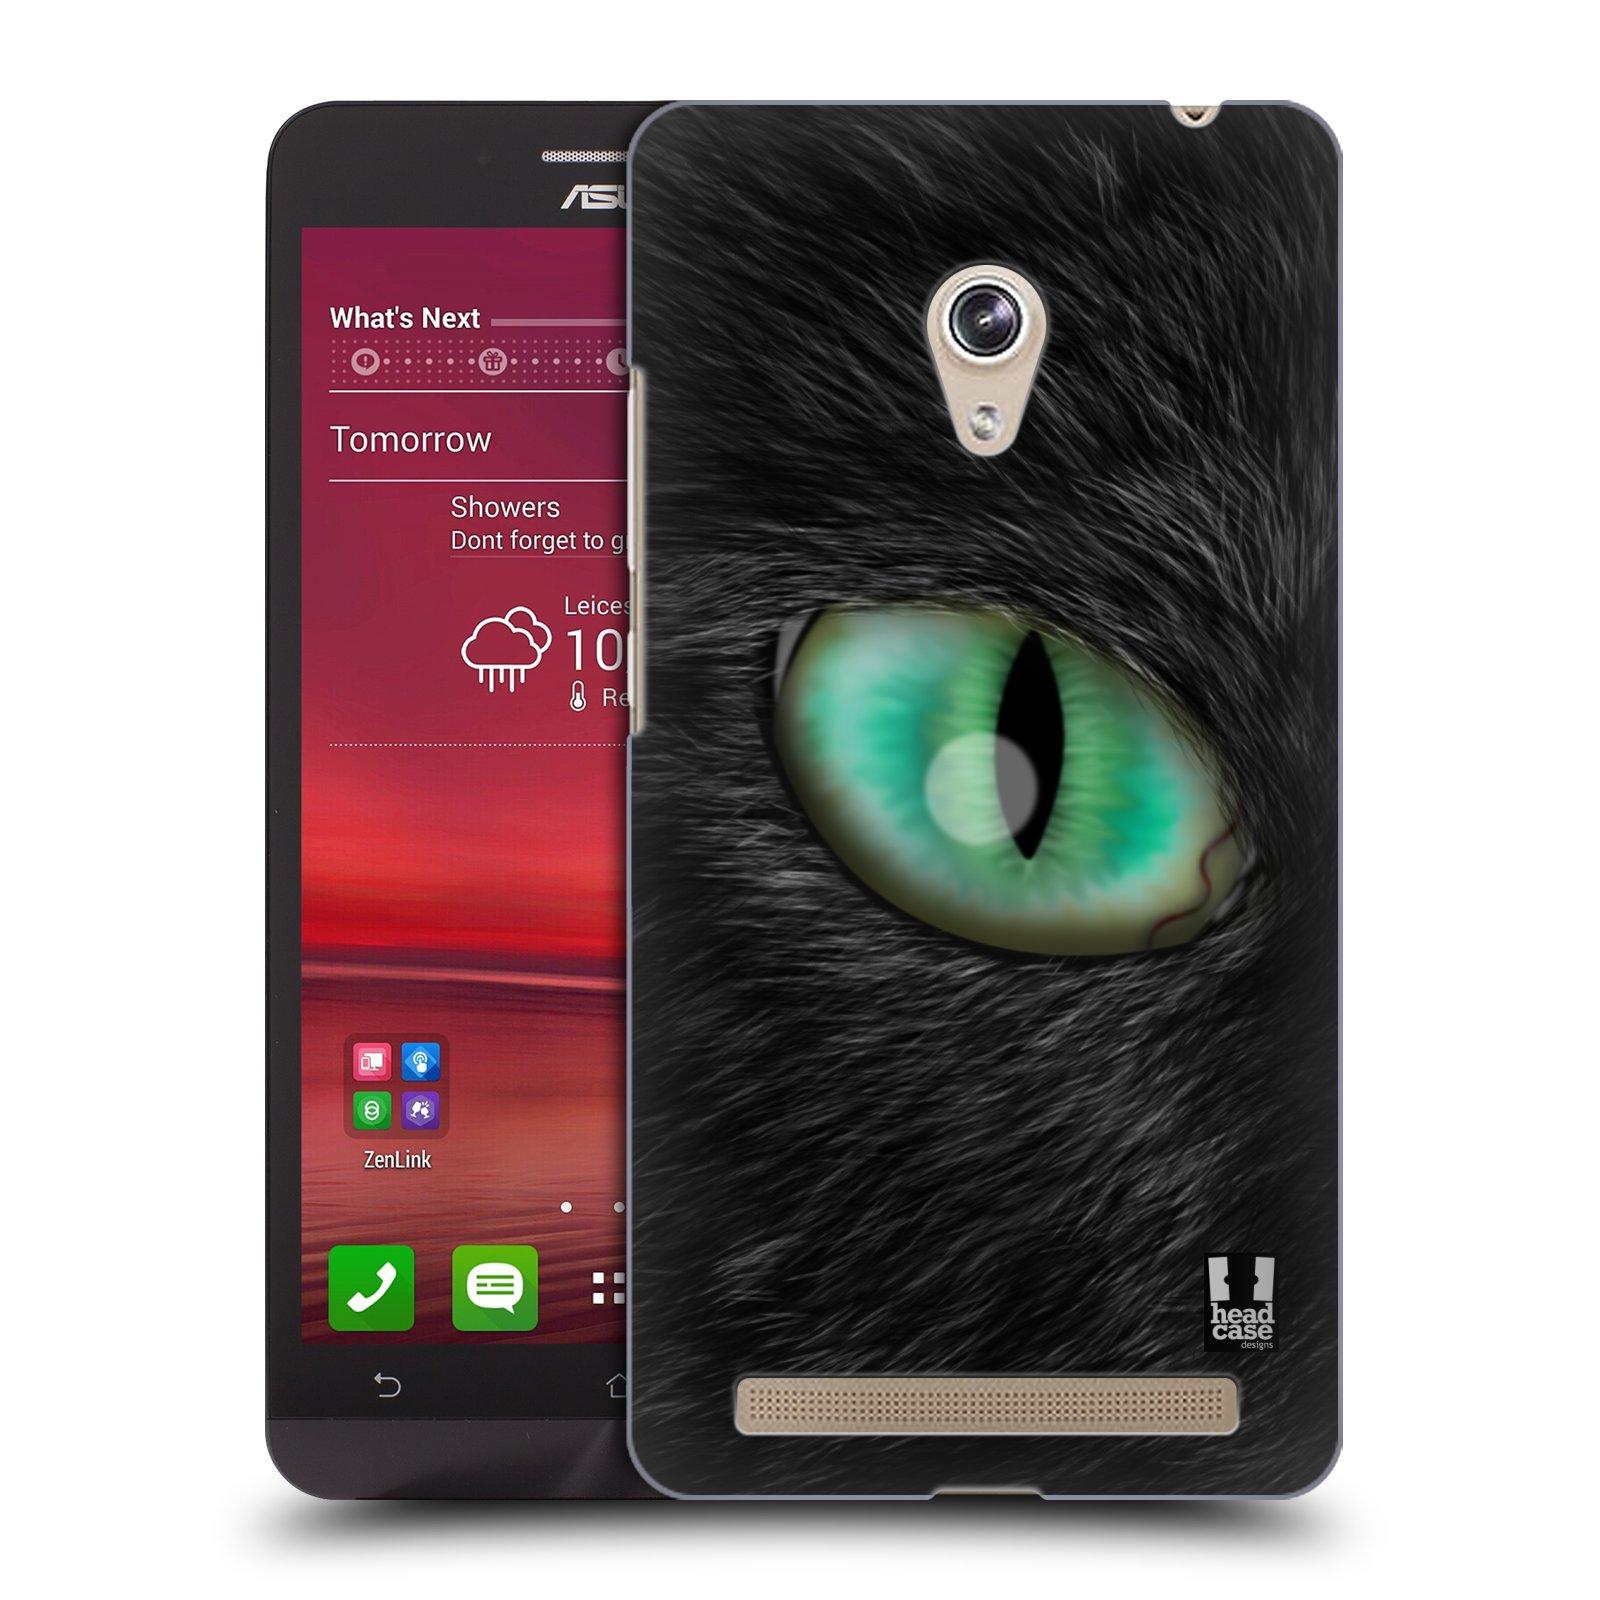 HEAD CASE plastový obal na mobil Asus Zenfone 6 vzor pohled zvířete oko kočka